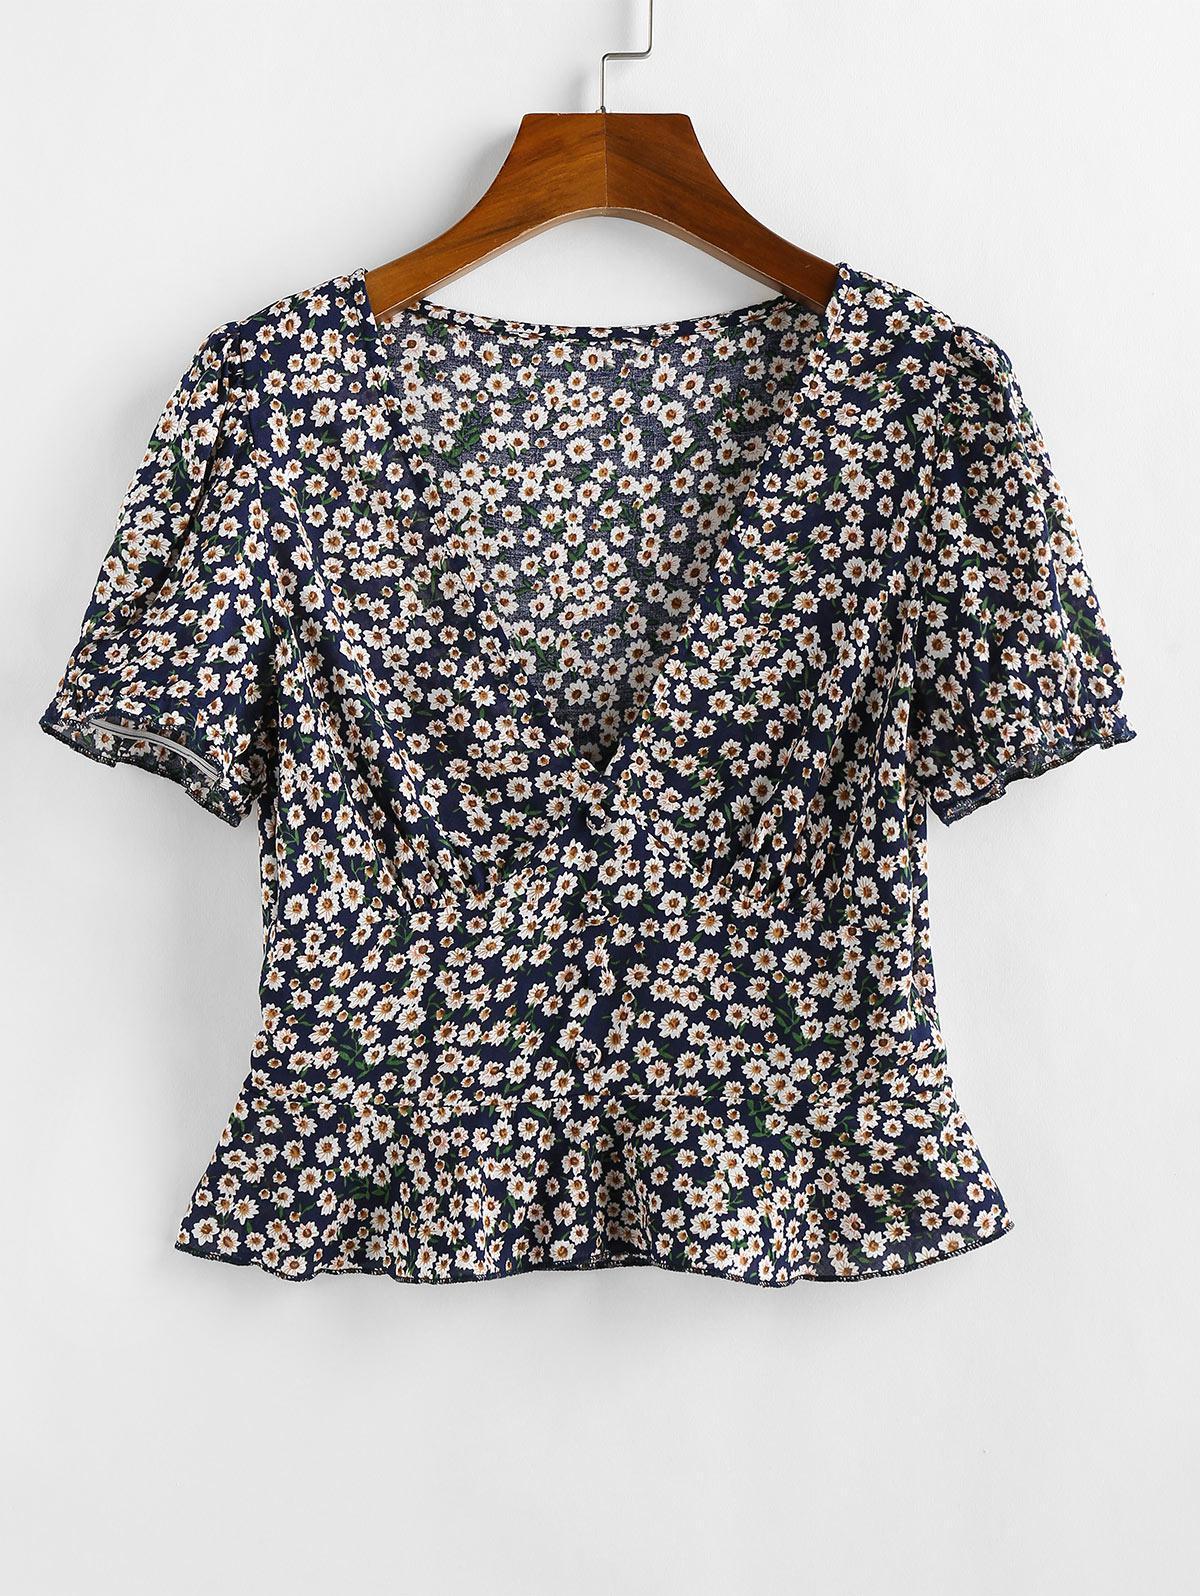 ZAFUL Ditsy Floral Flounce Short Sleeve Blouse thumbnail